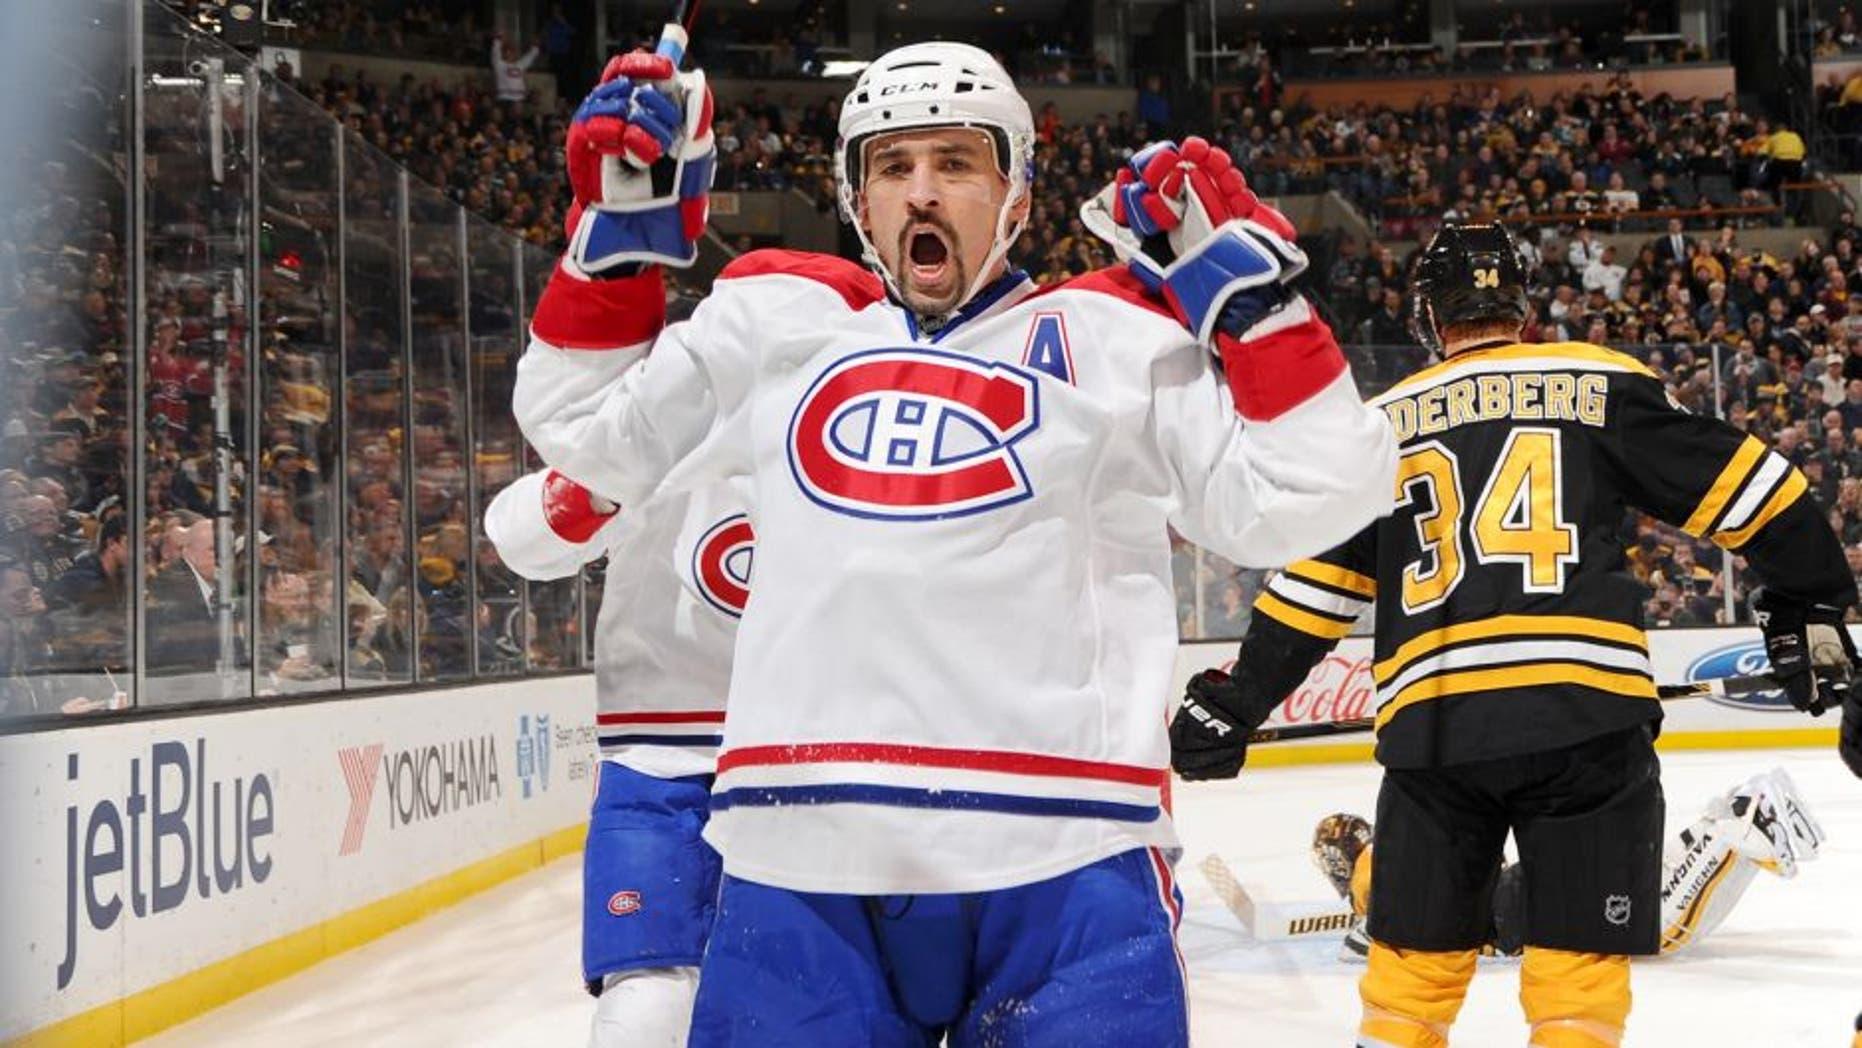 BOSTON, MA - NOVEMBER 22 : Tomas Plekanec #14 of the Montreal Canadiens celebrates a goal against the Boston Bruins at the TD Garden on November 22, 2014 in Boston, Massachusetts. (Photo by Steve Babineau/NHLI via Getty Images)